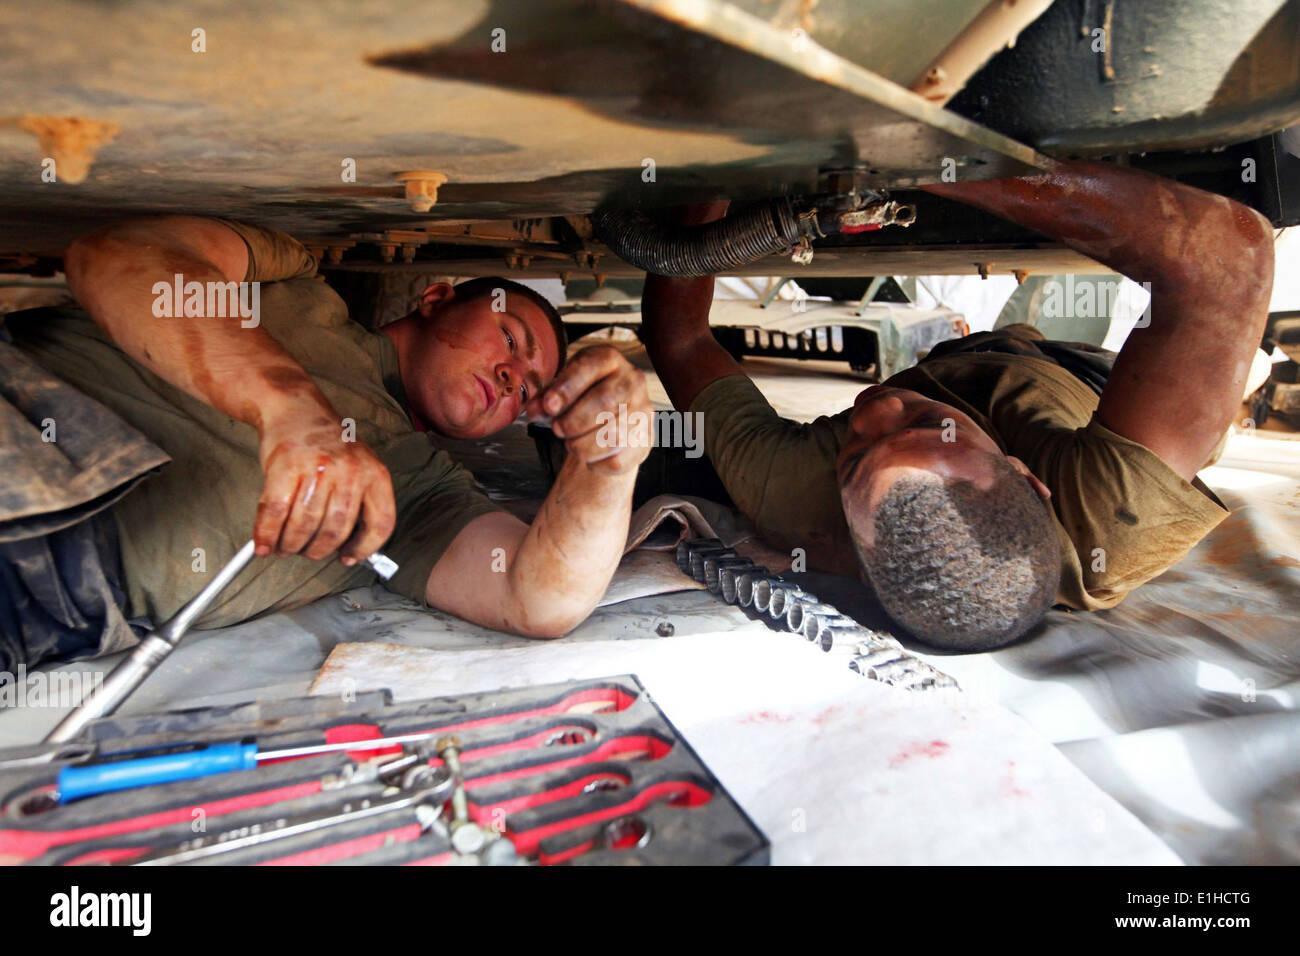 U.S. Marine Corps Lance Cpl. Bryan Planty, left, and Lance Cpl ...